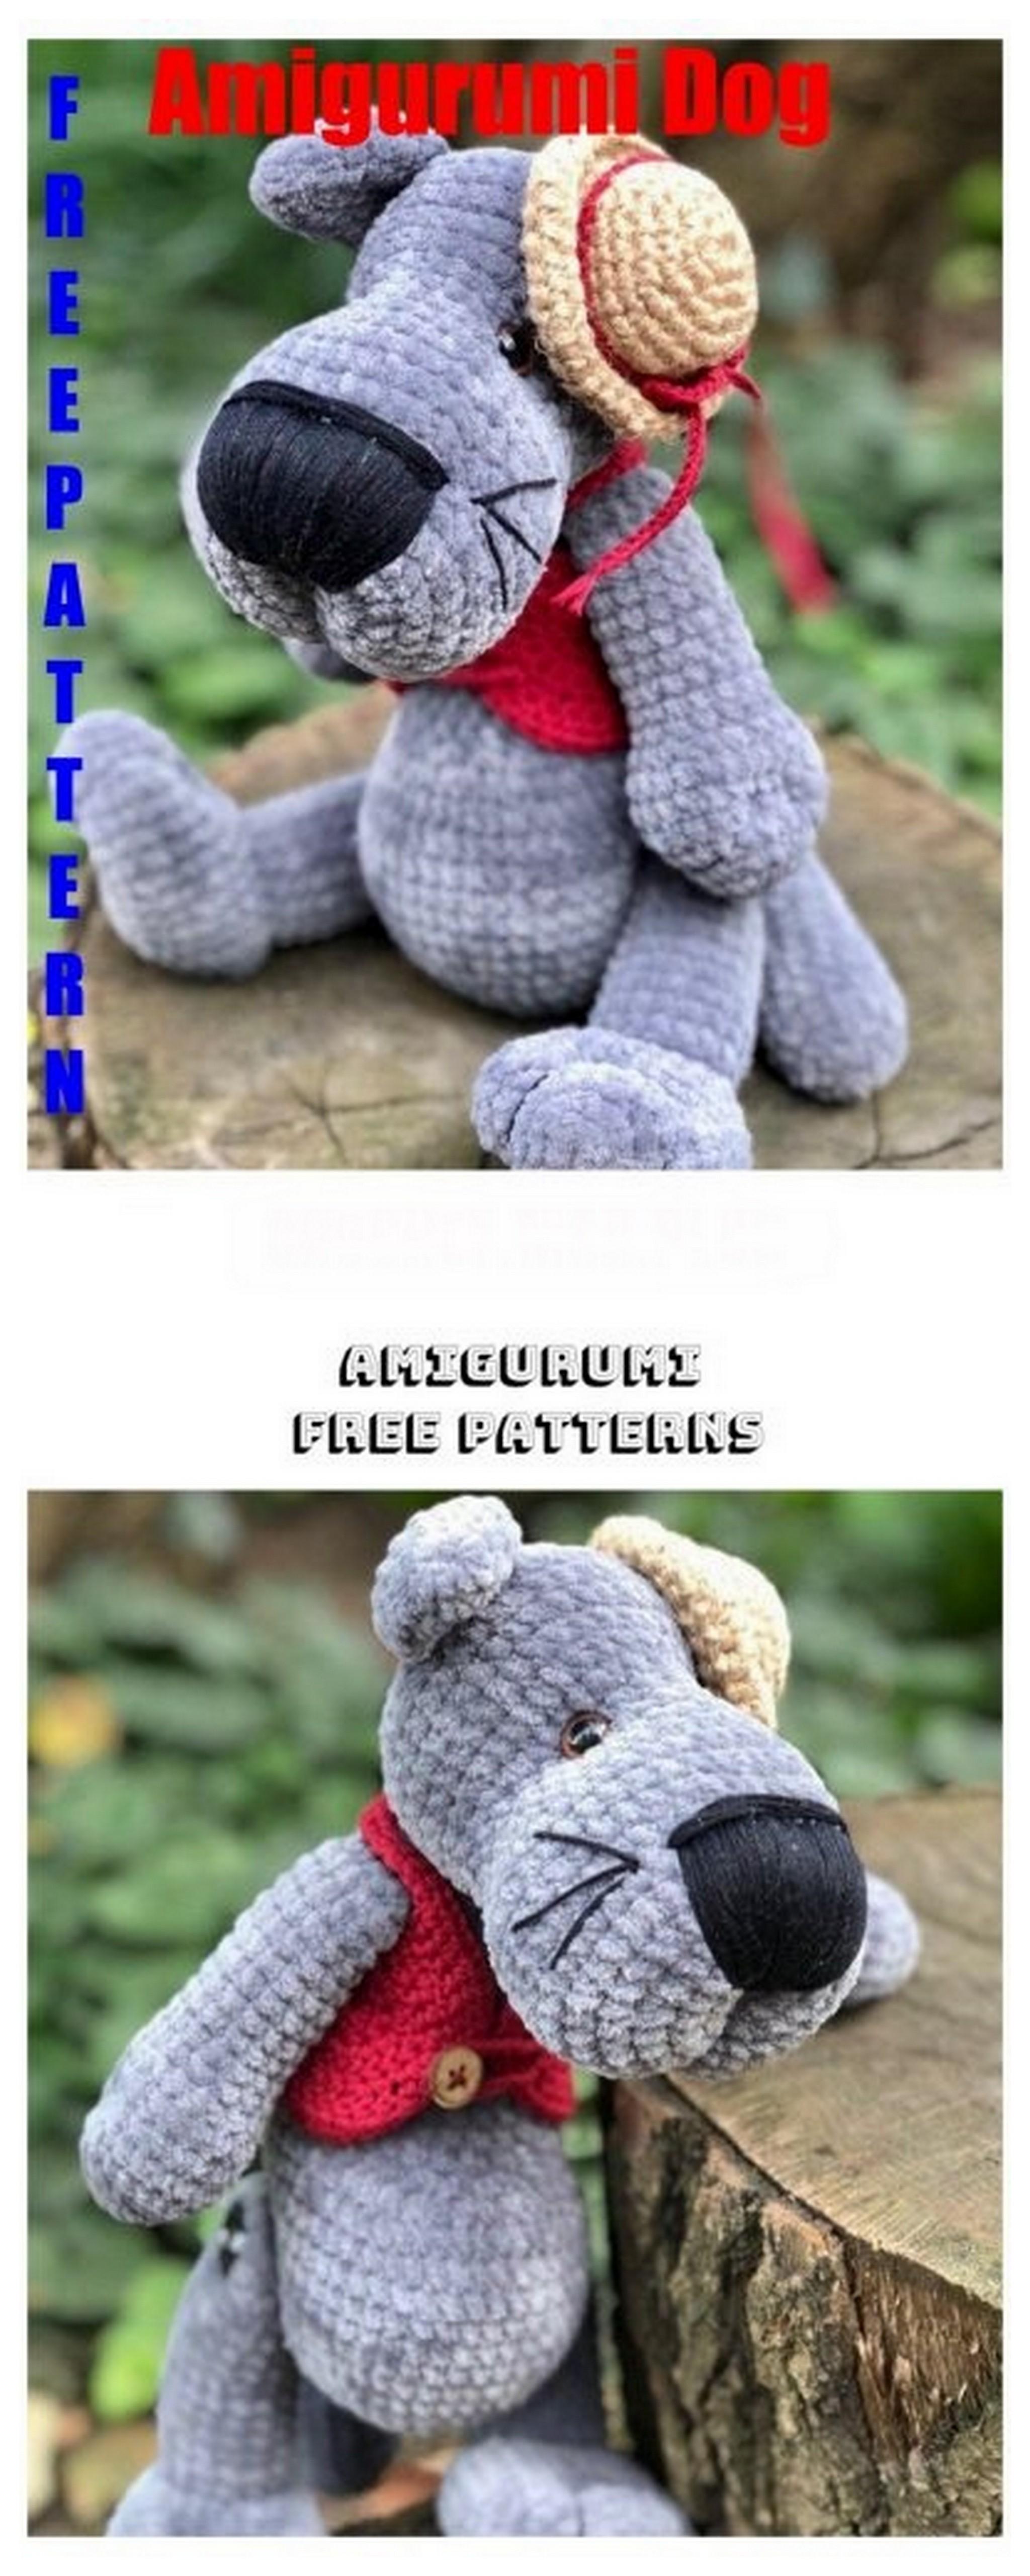 Amigurumi Hello Kitty Free Crochet Pattern - Crochet.msa.plus | 5120x2048